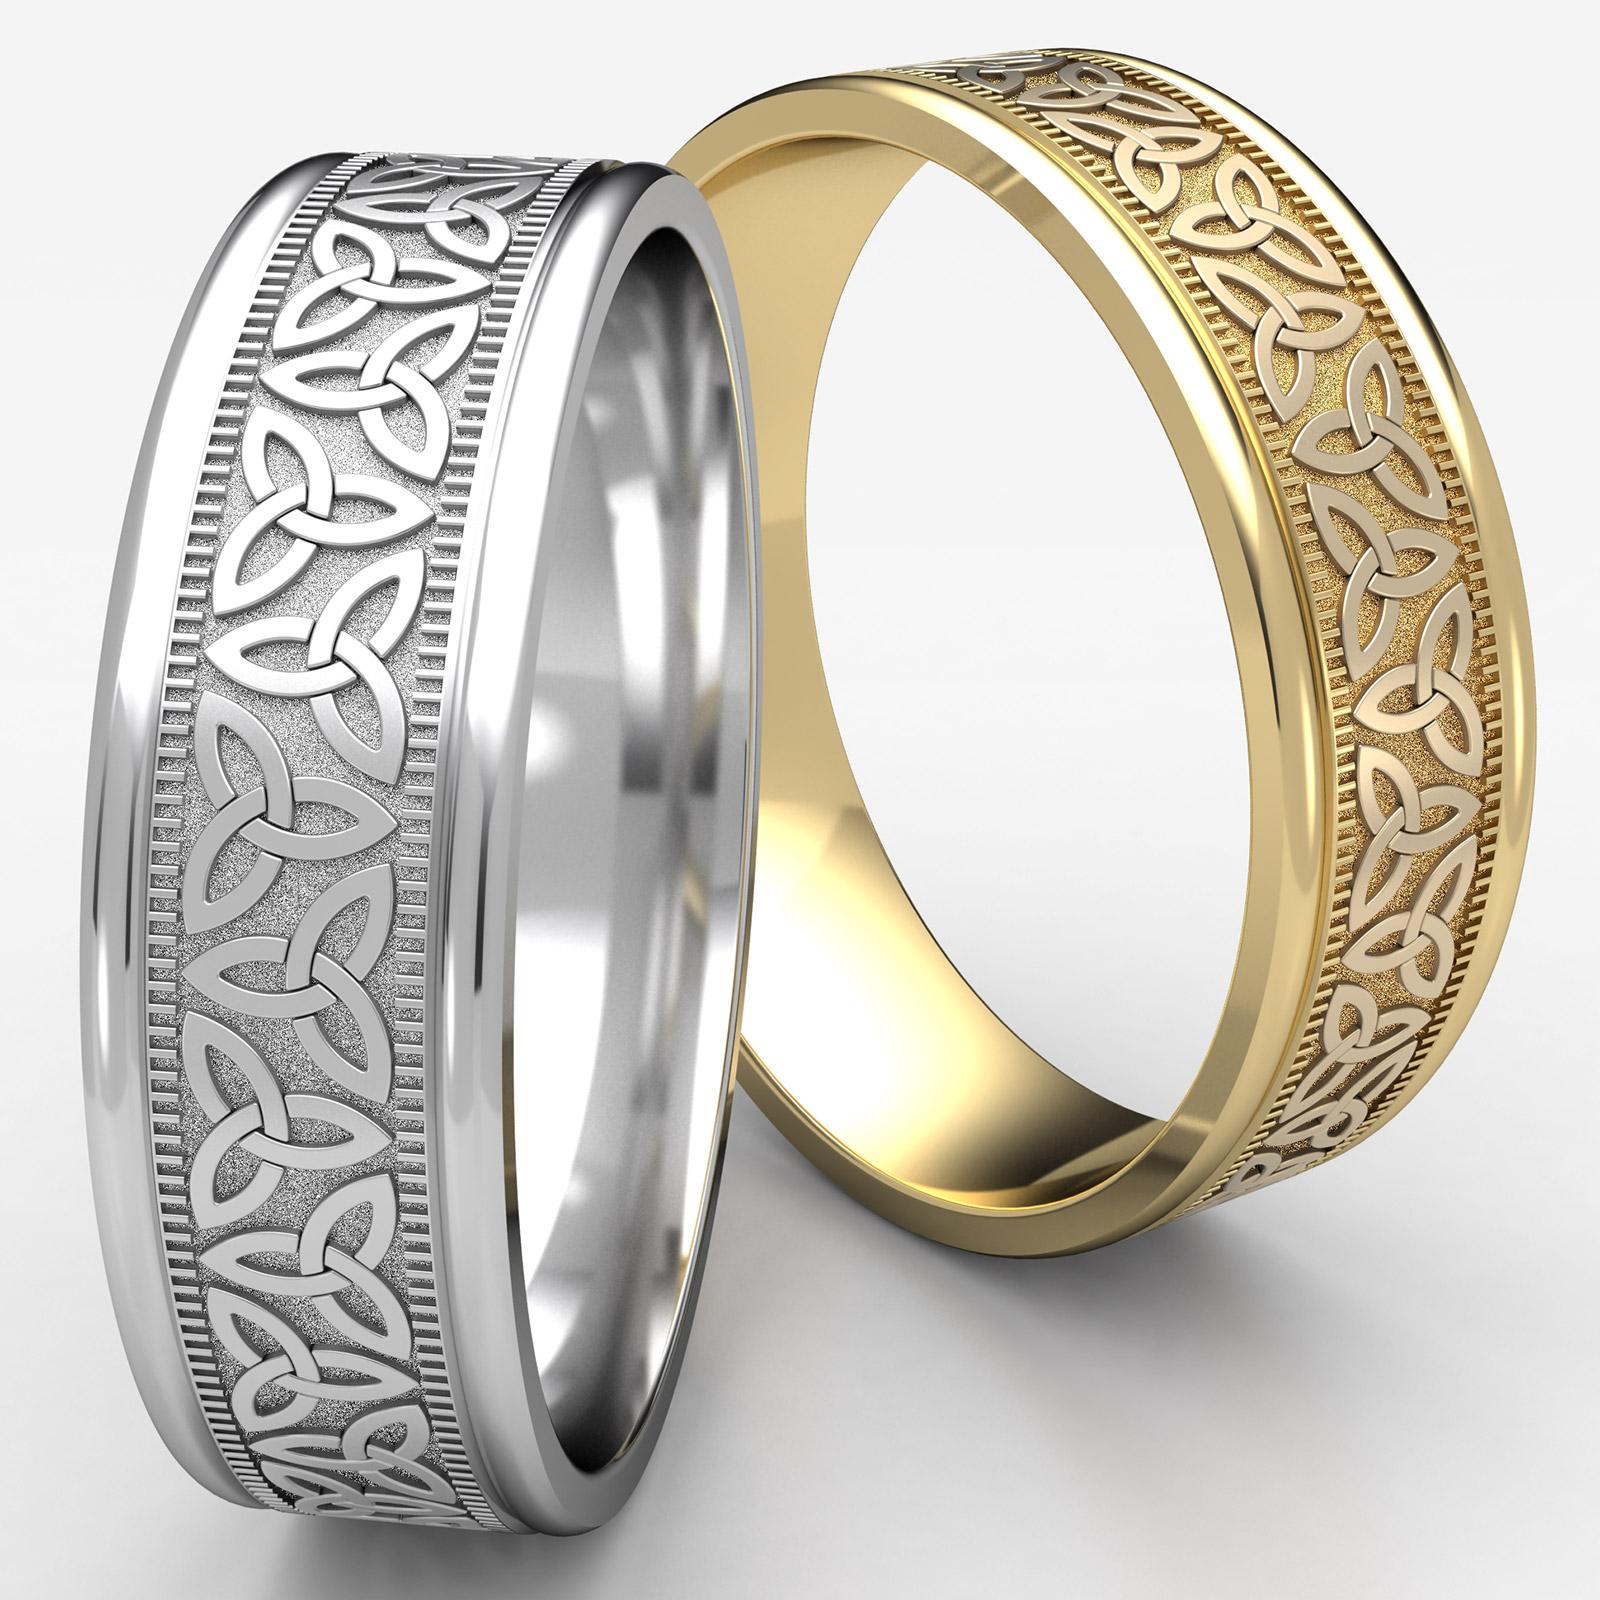 14k Yellow Gold High Polished 2mm Traditional Milgrain: Love Knot Traingle Round Edge Men's Wedding Band 14k Gold